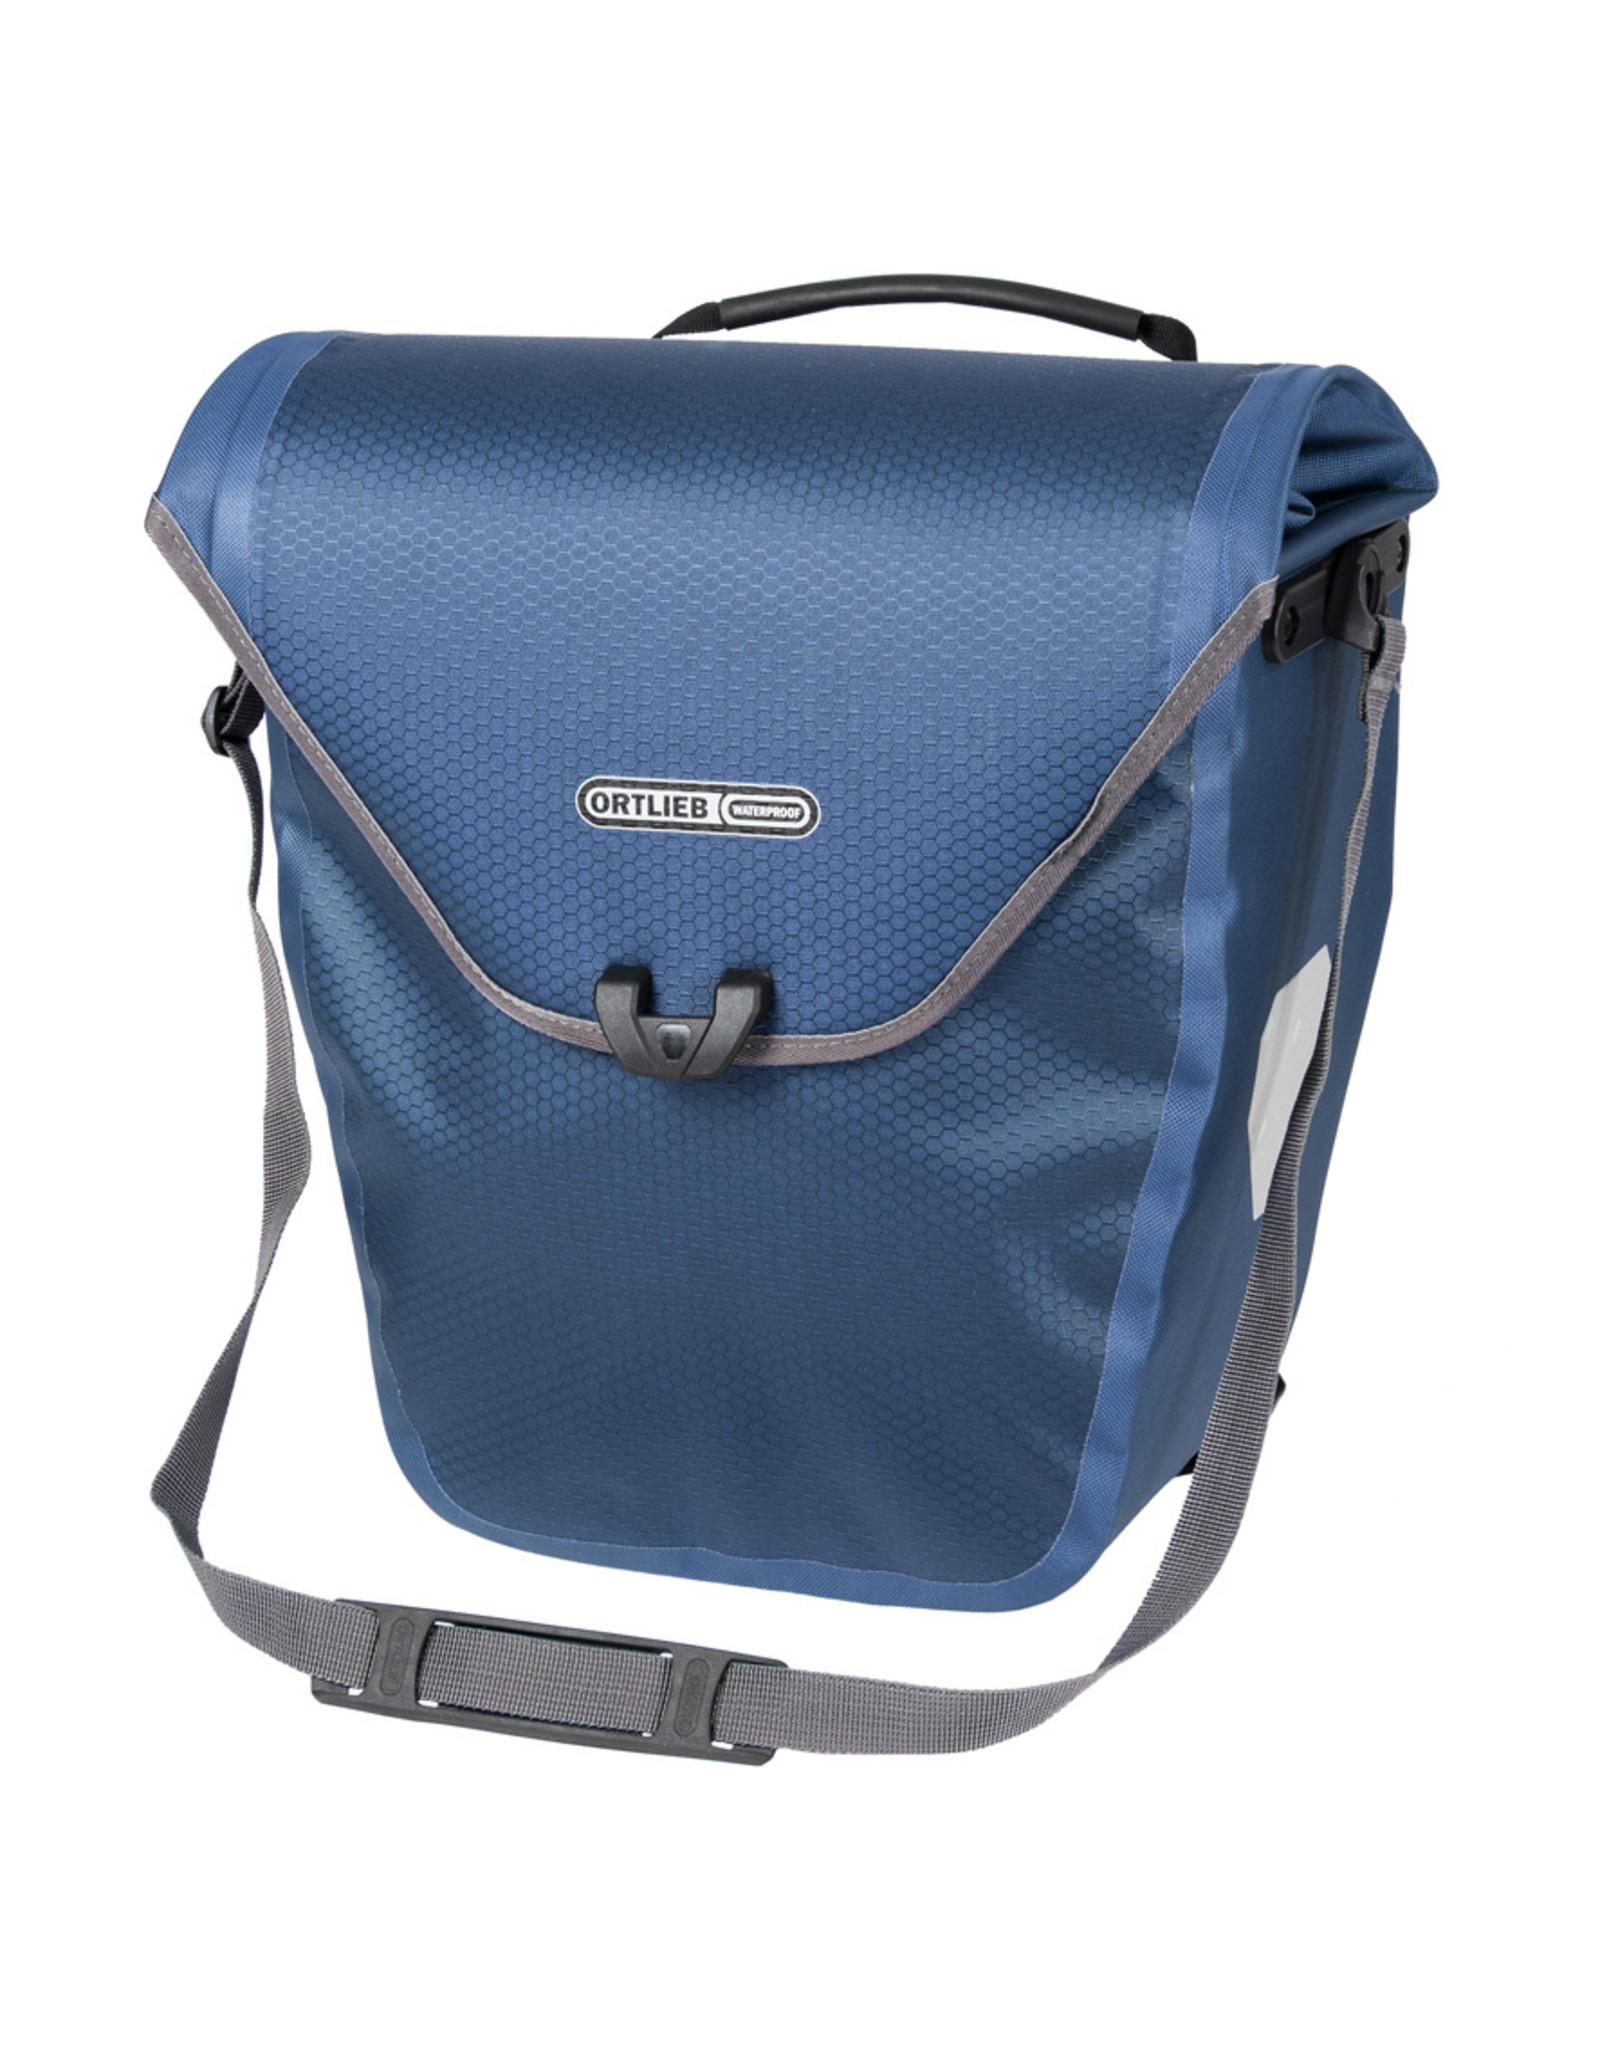 Ortlieb Velo-Shopper 18L